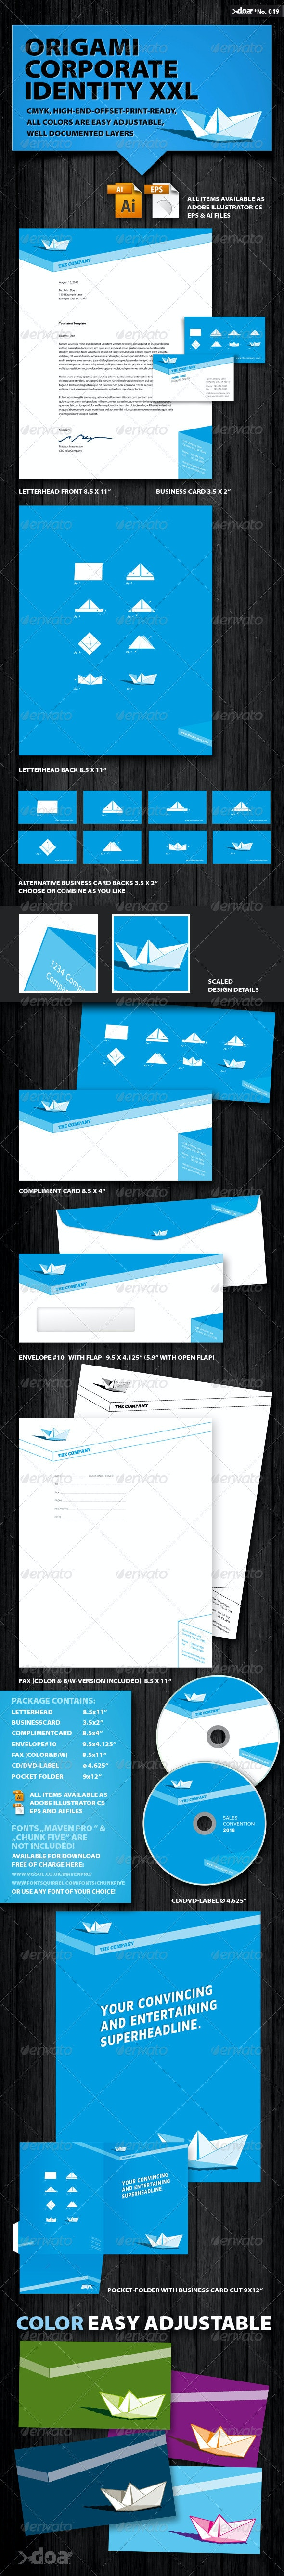 Origami Corporate Identity XXL - Stationery Print Templates